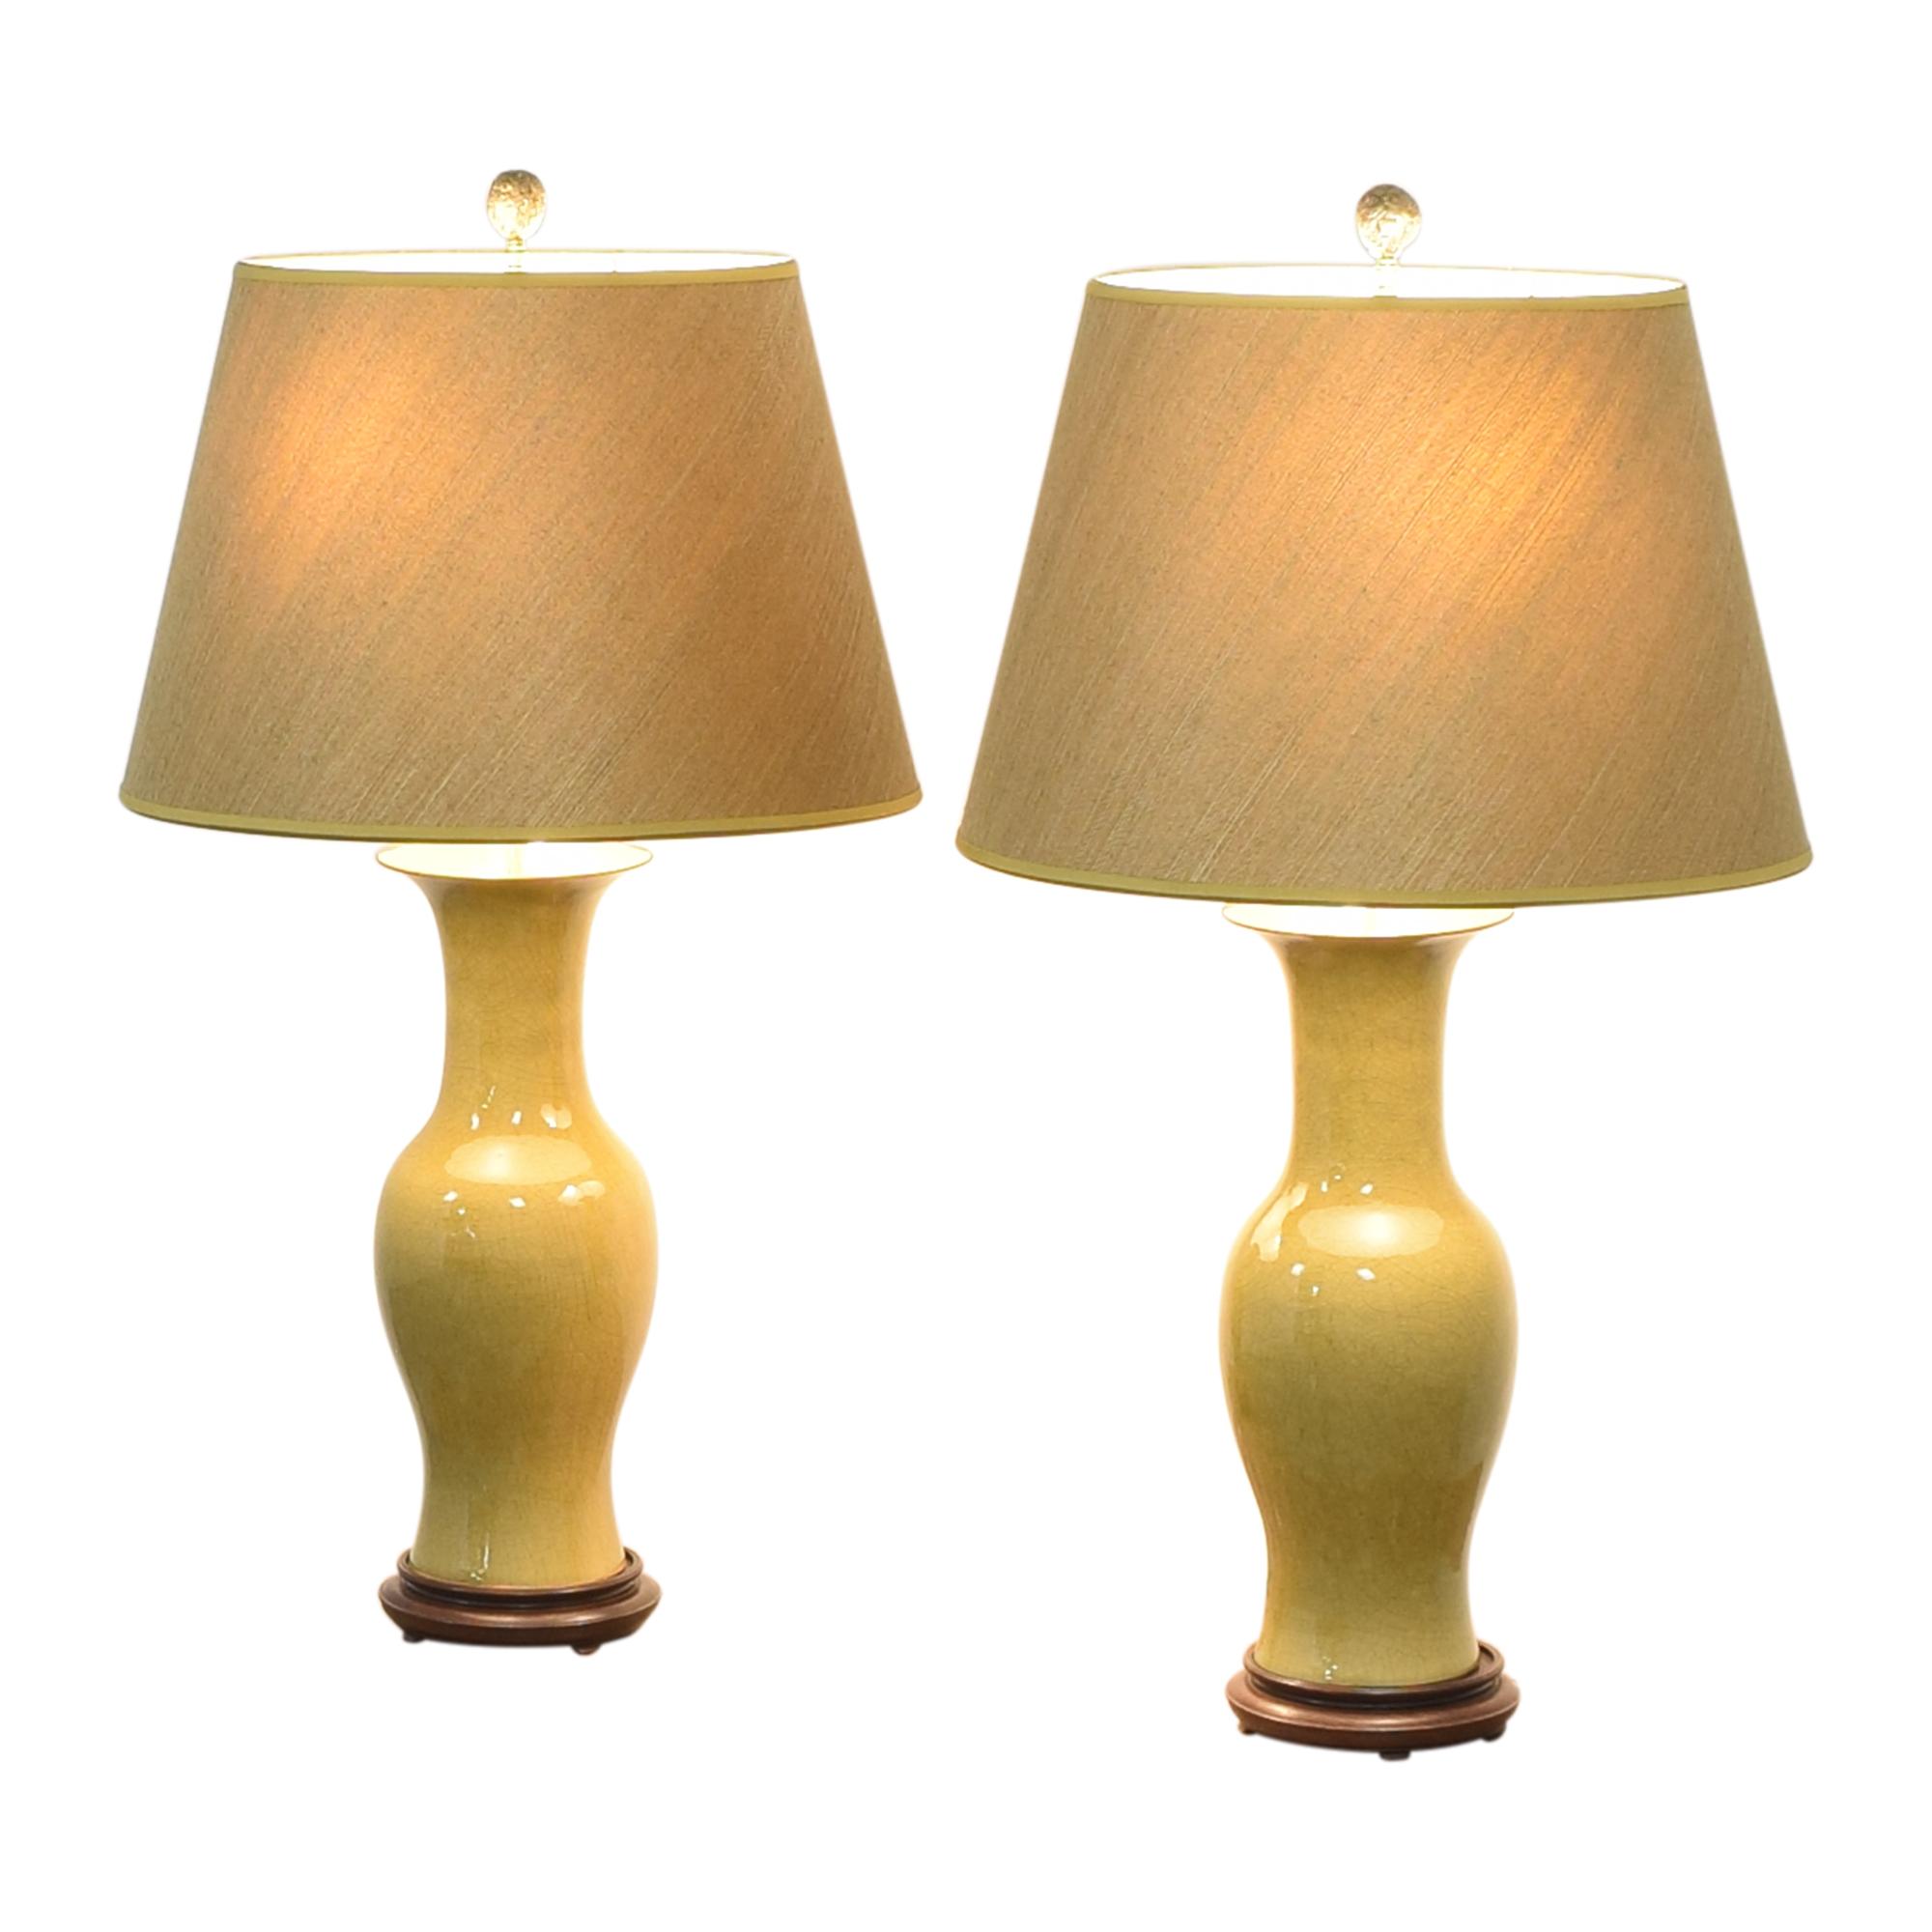 Warren Kessler Urn Table Lamps Warren Kessler